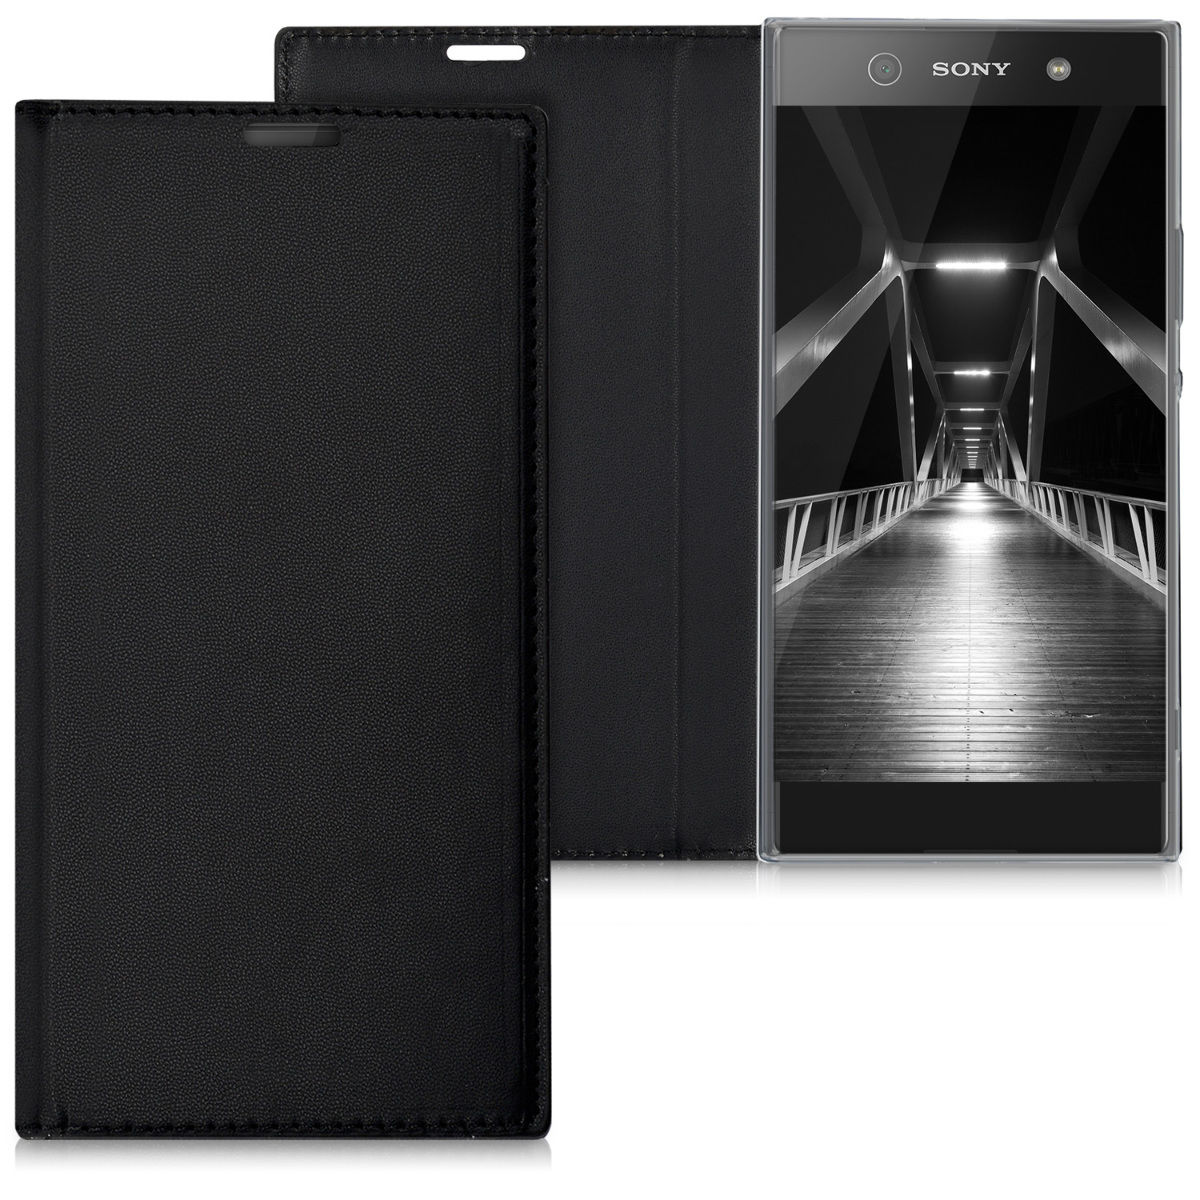 Pouzdro FLIP pro Sony Xperia XA1 Ultra černé